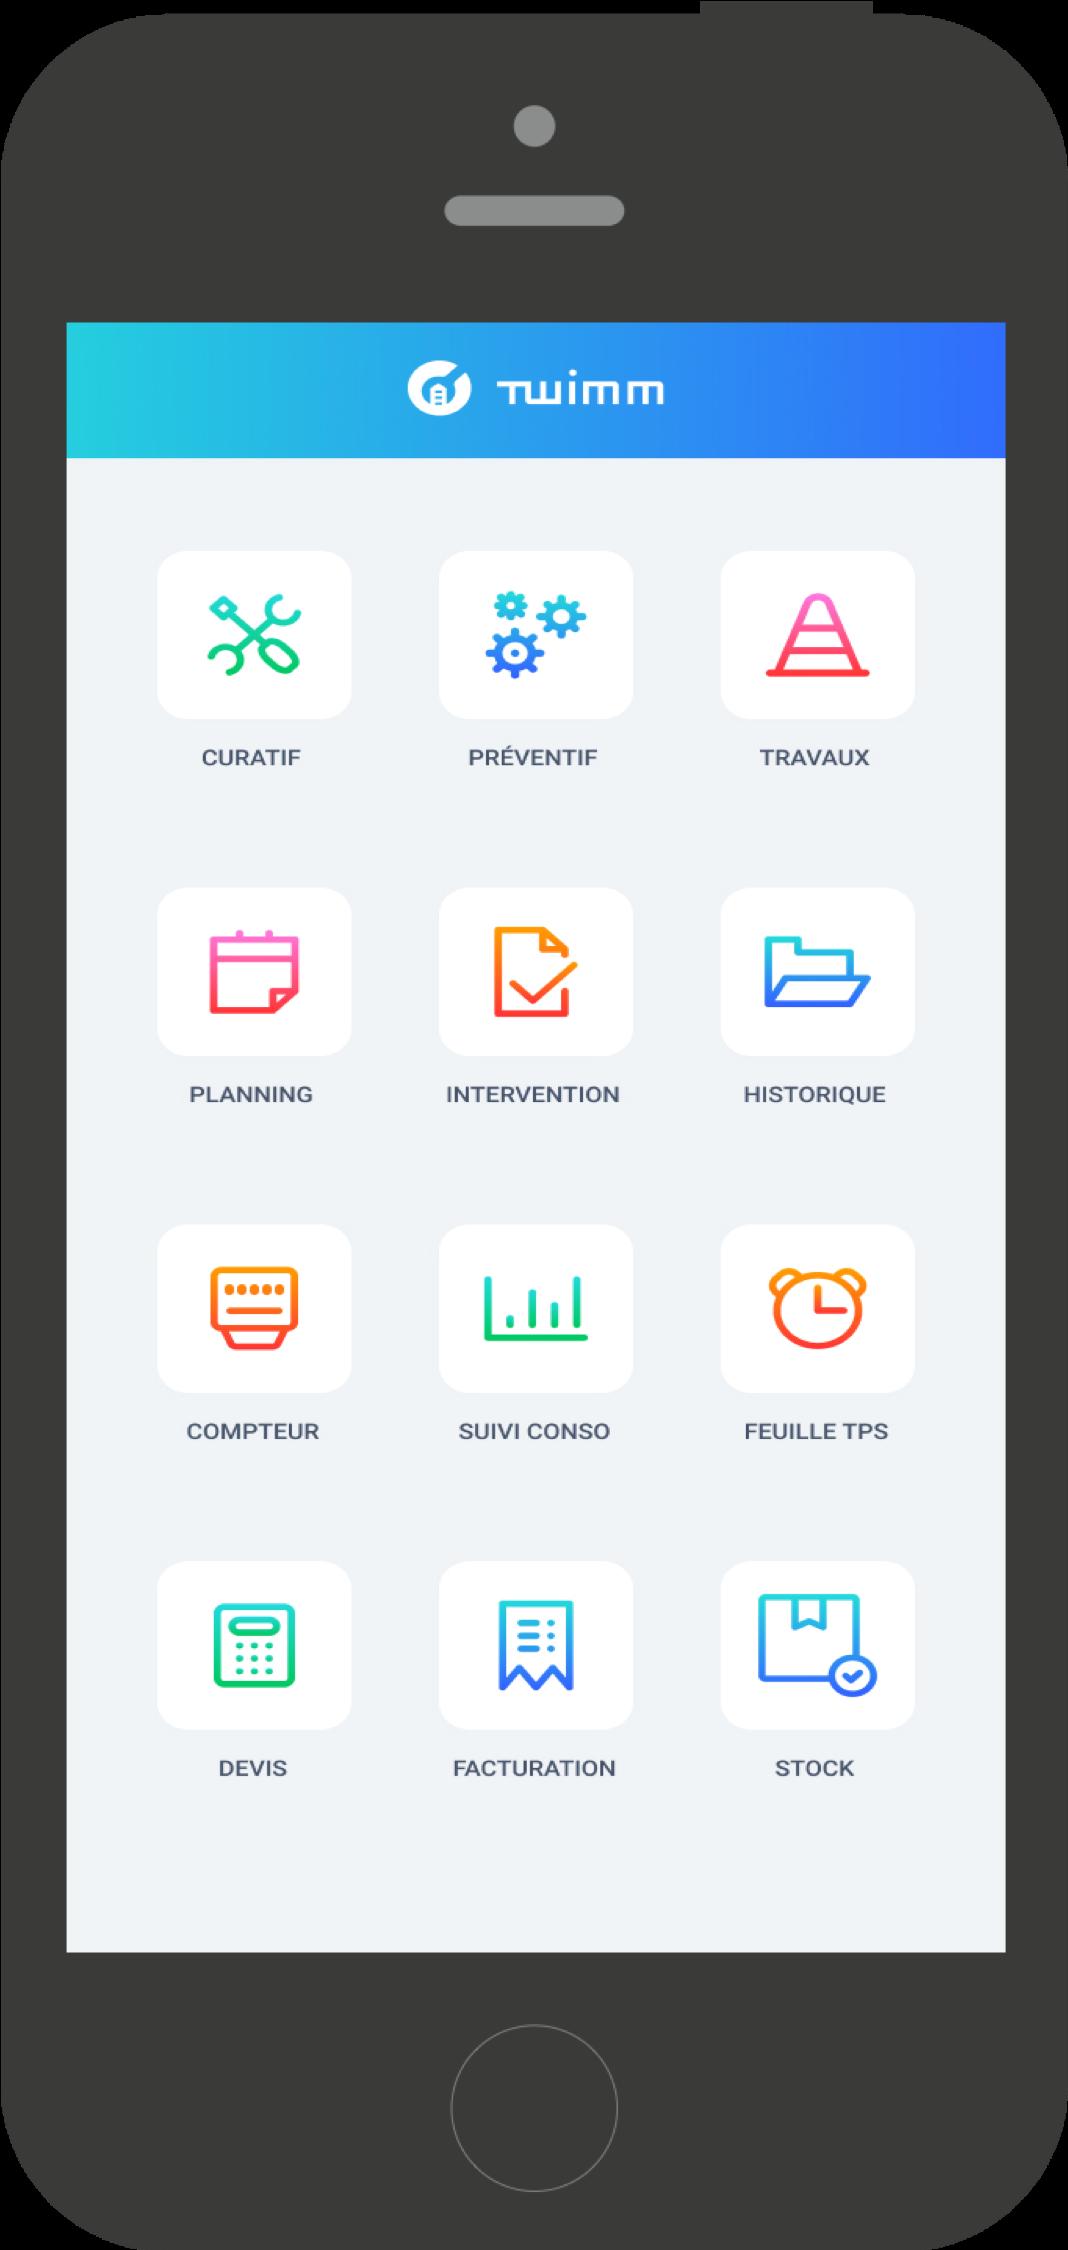 Twimm mobile application